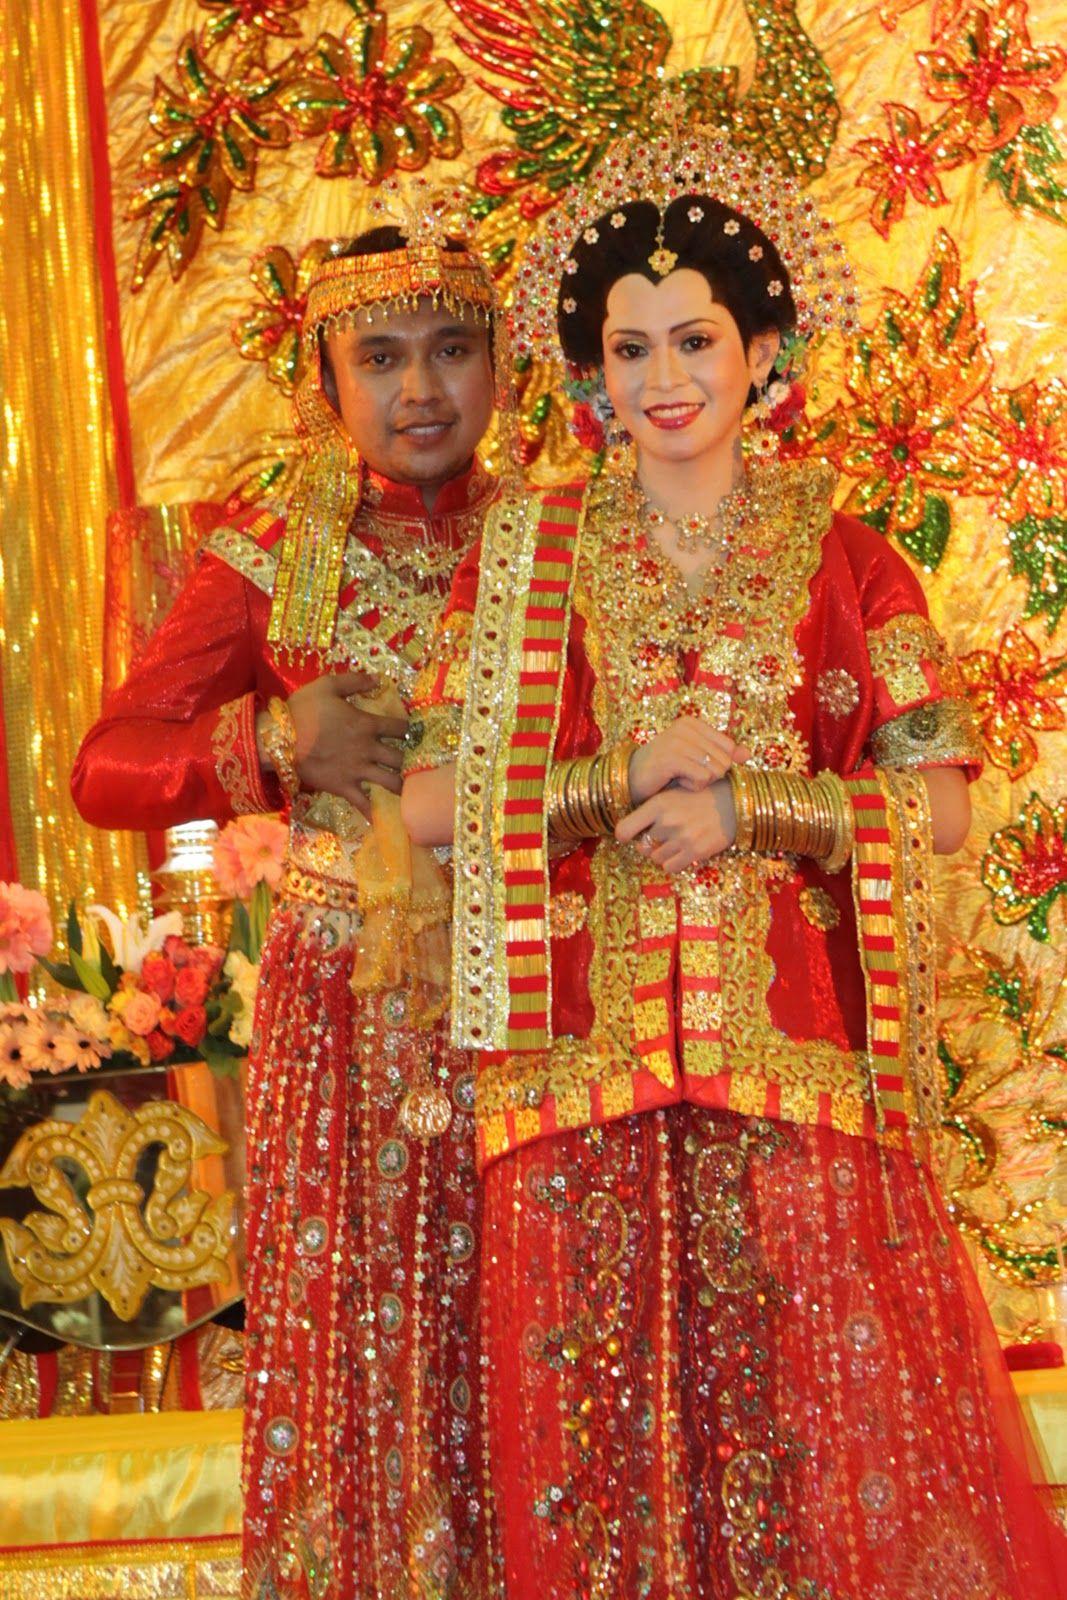 Rumah Pengantin Bugis Makassar  Pengantin, Pakaian pengantin